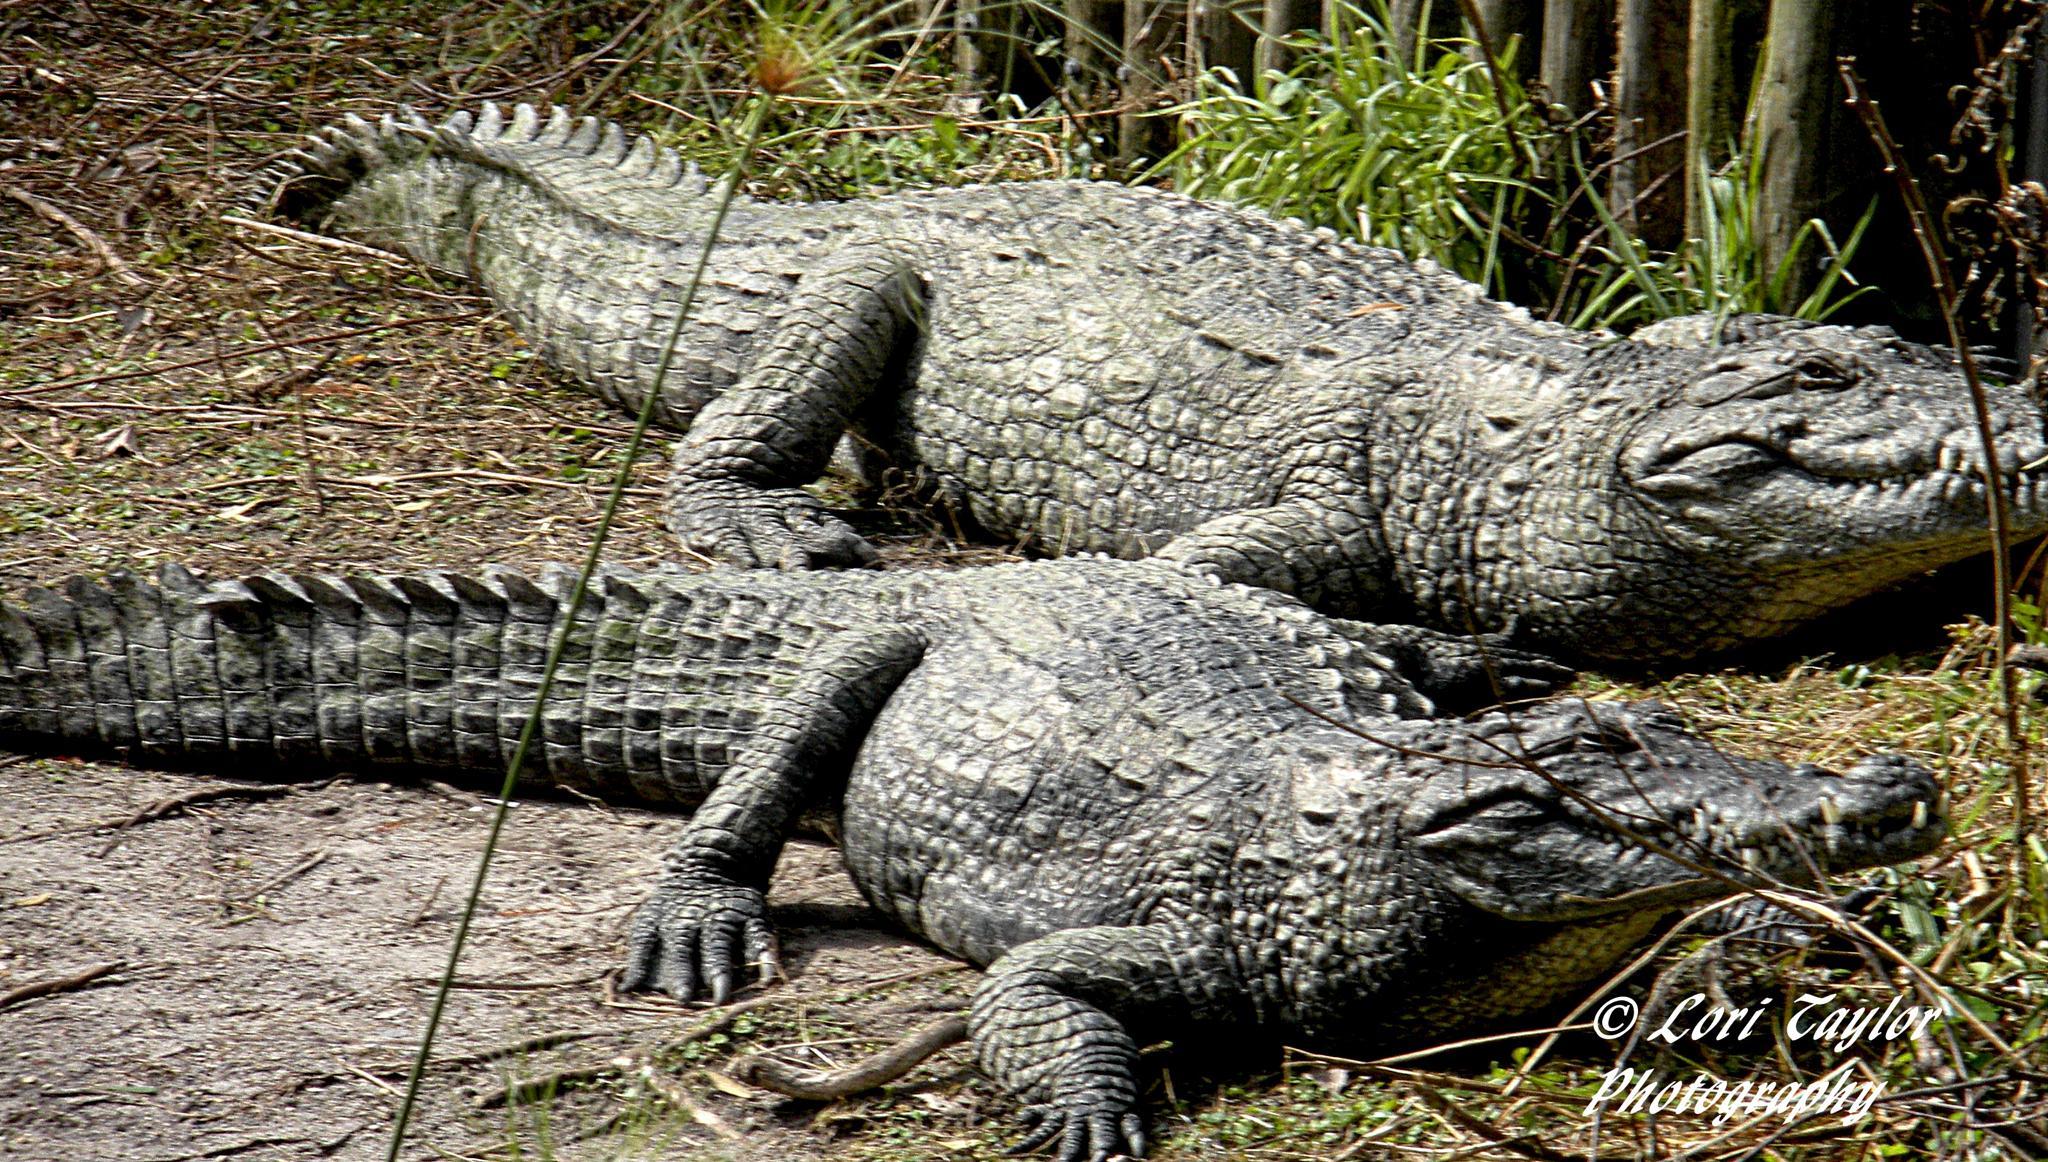 Alligator by Lori21929